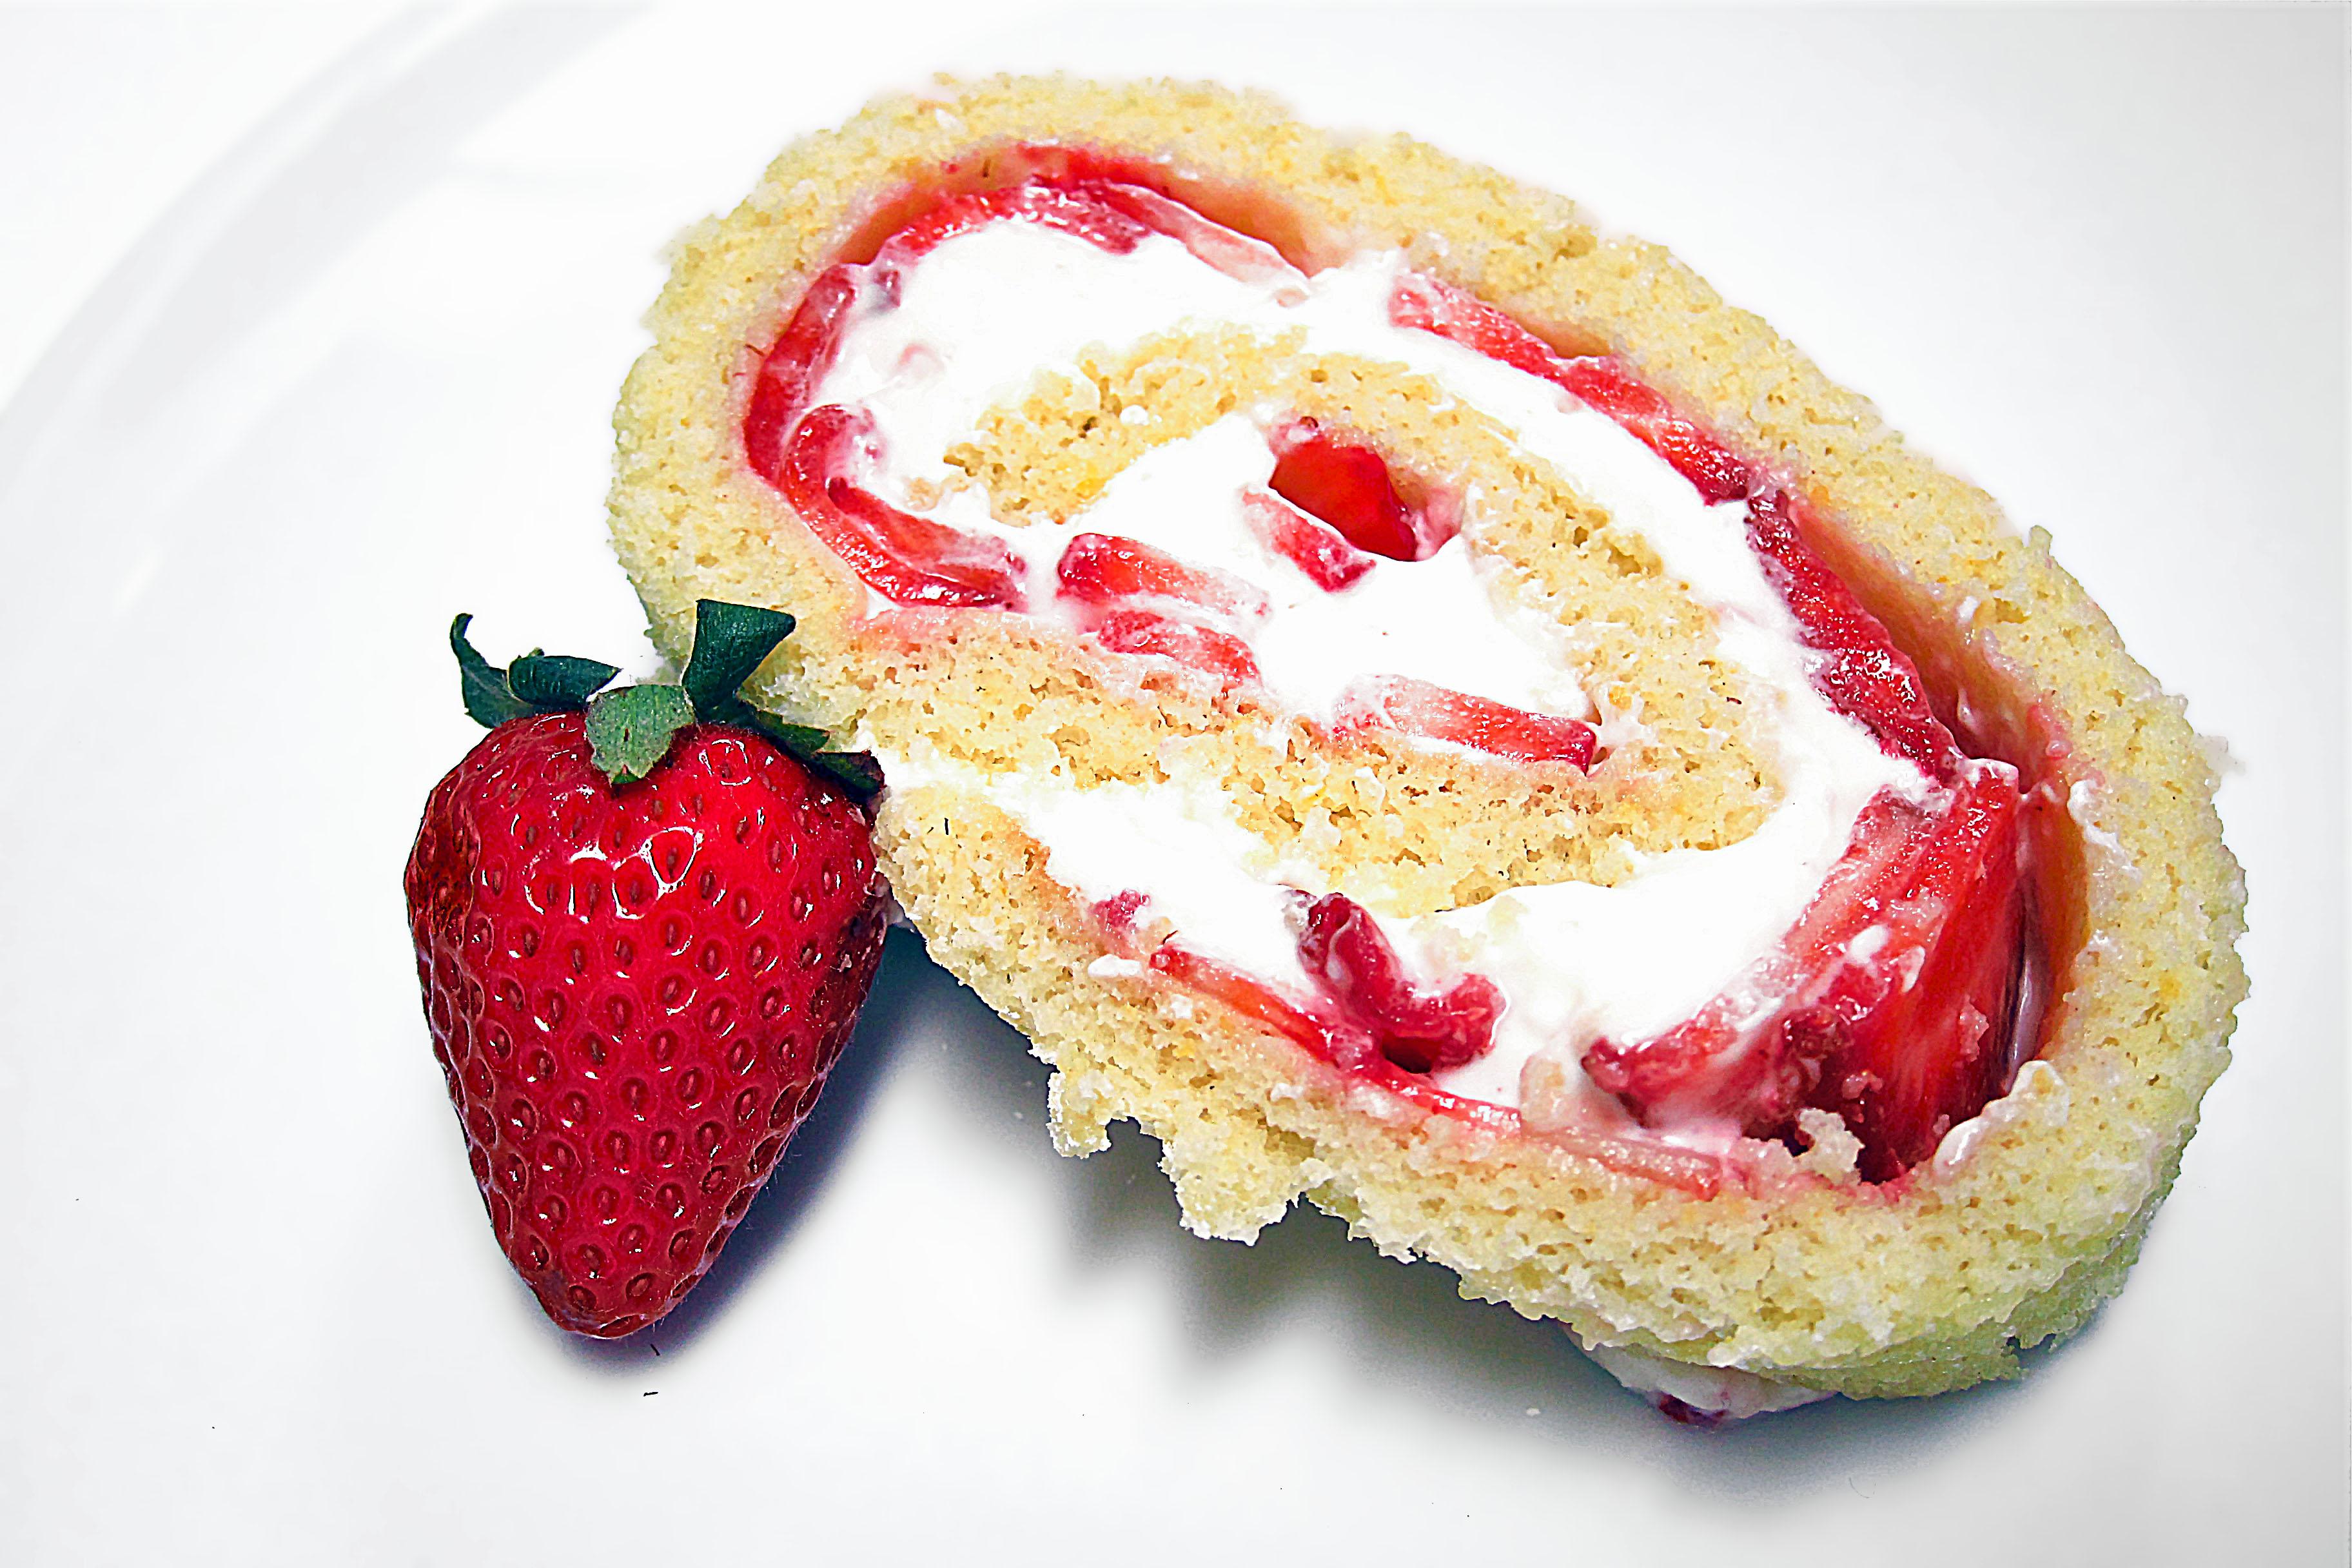 Strawberry Cake Recipe With Jelly: Strawberry Cheesecake Jelly Roll Cake